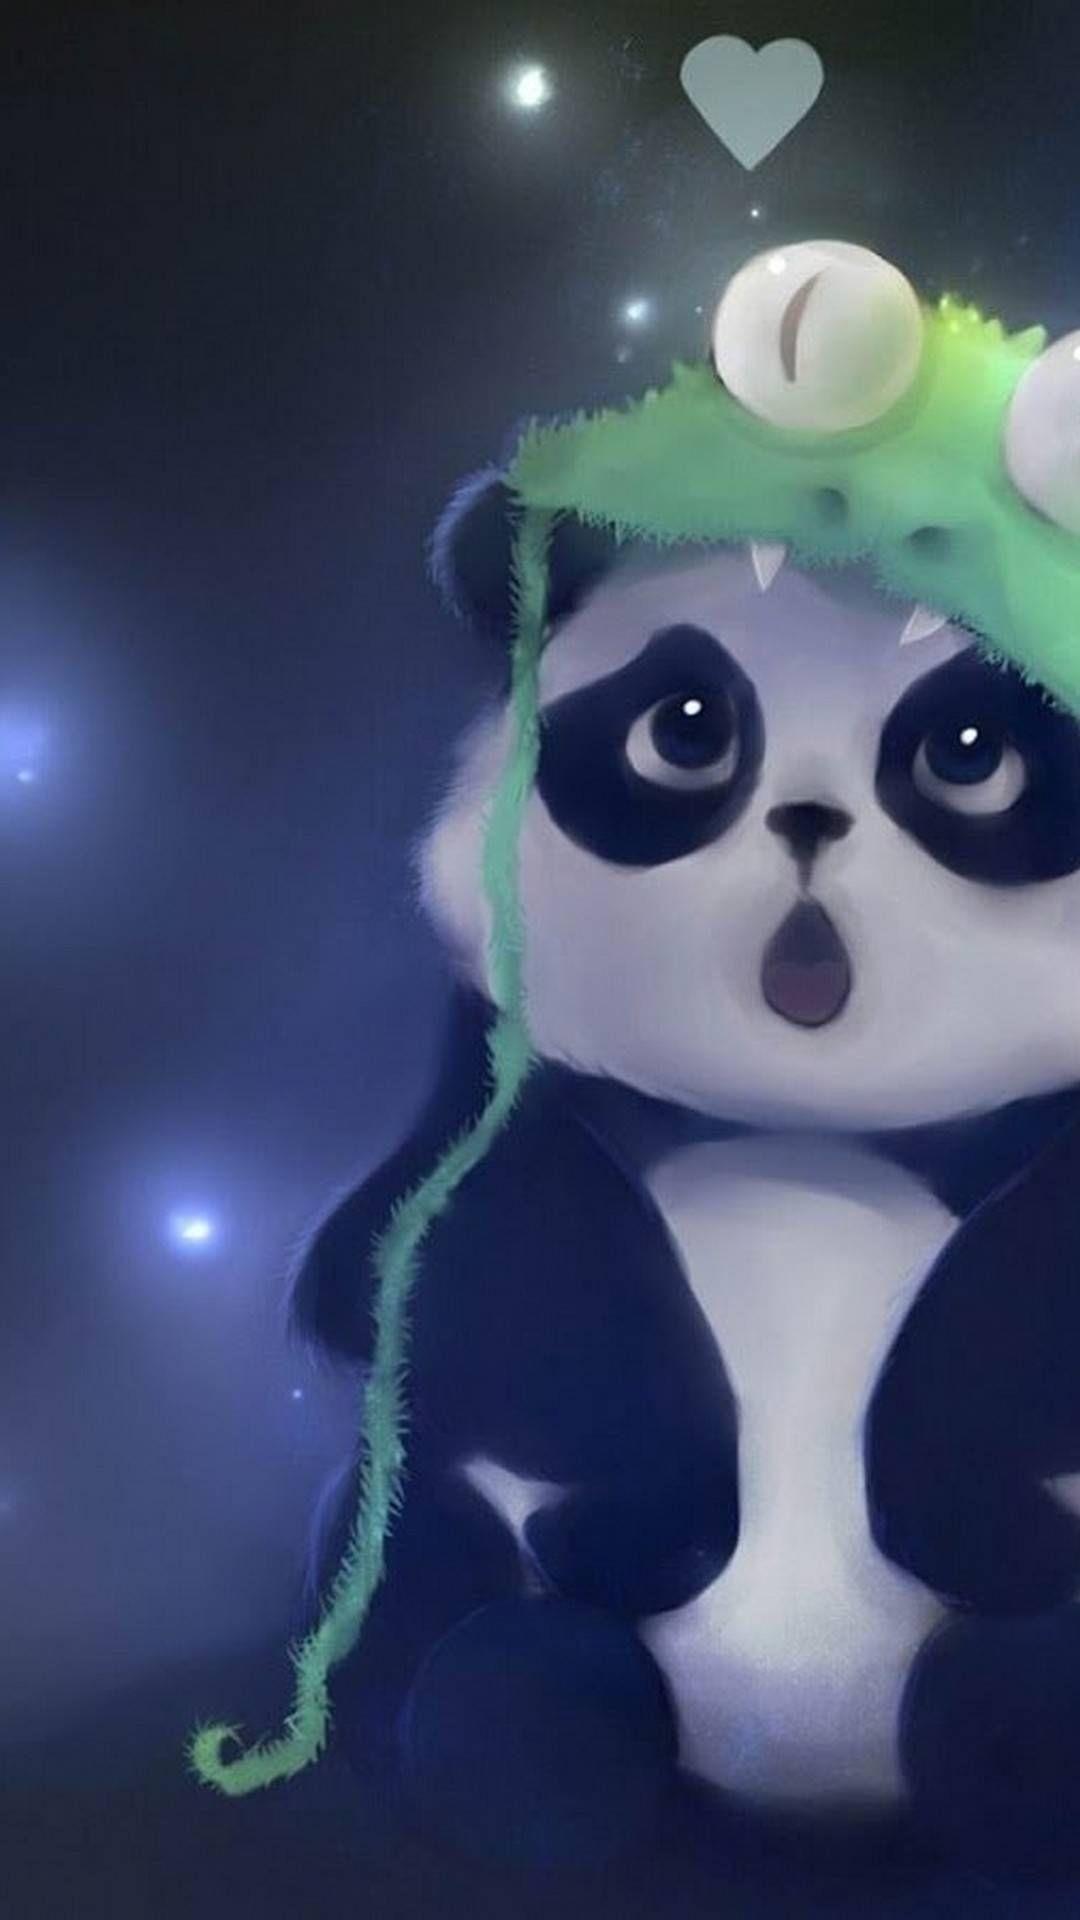 Res: 1080x1920, cute panda wallpaper iphone #1404838